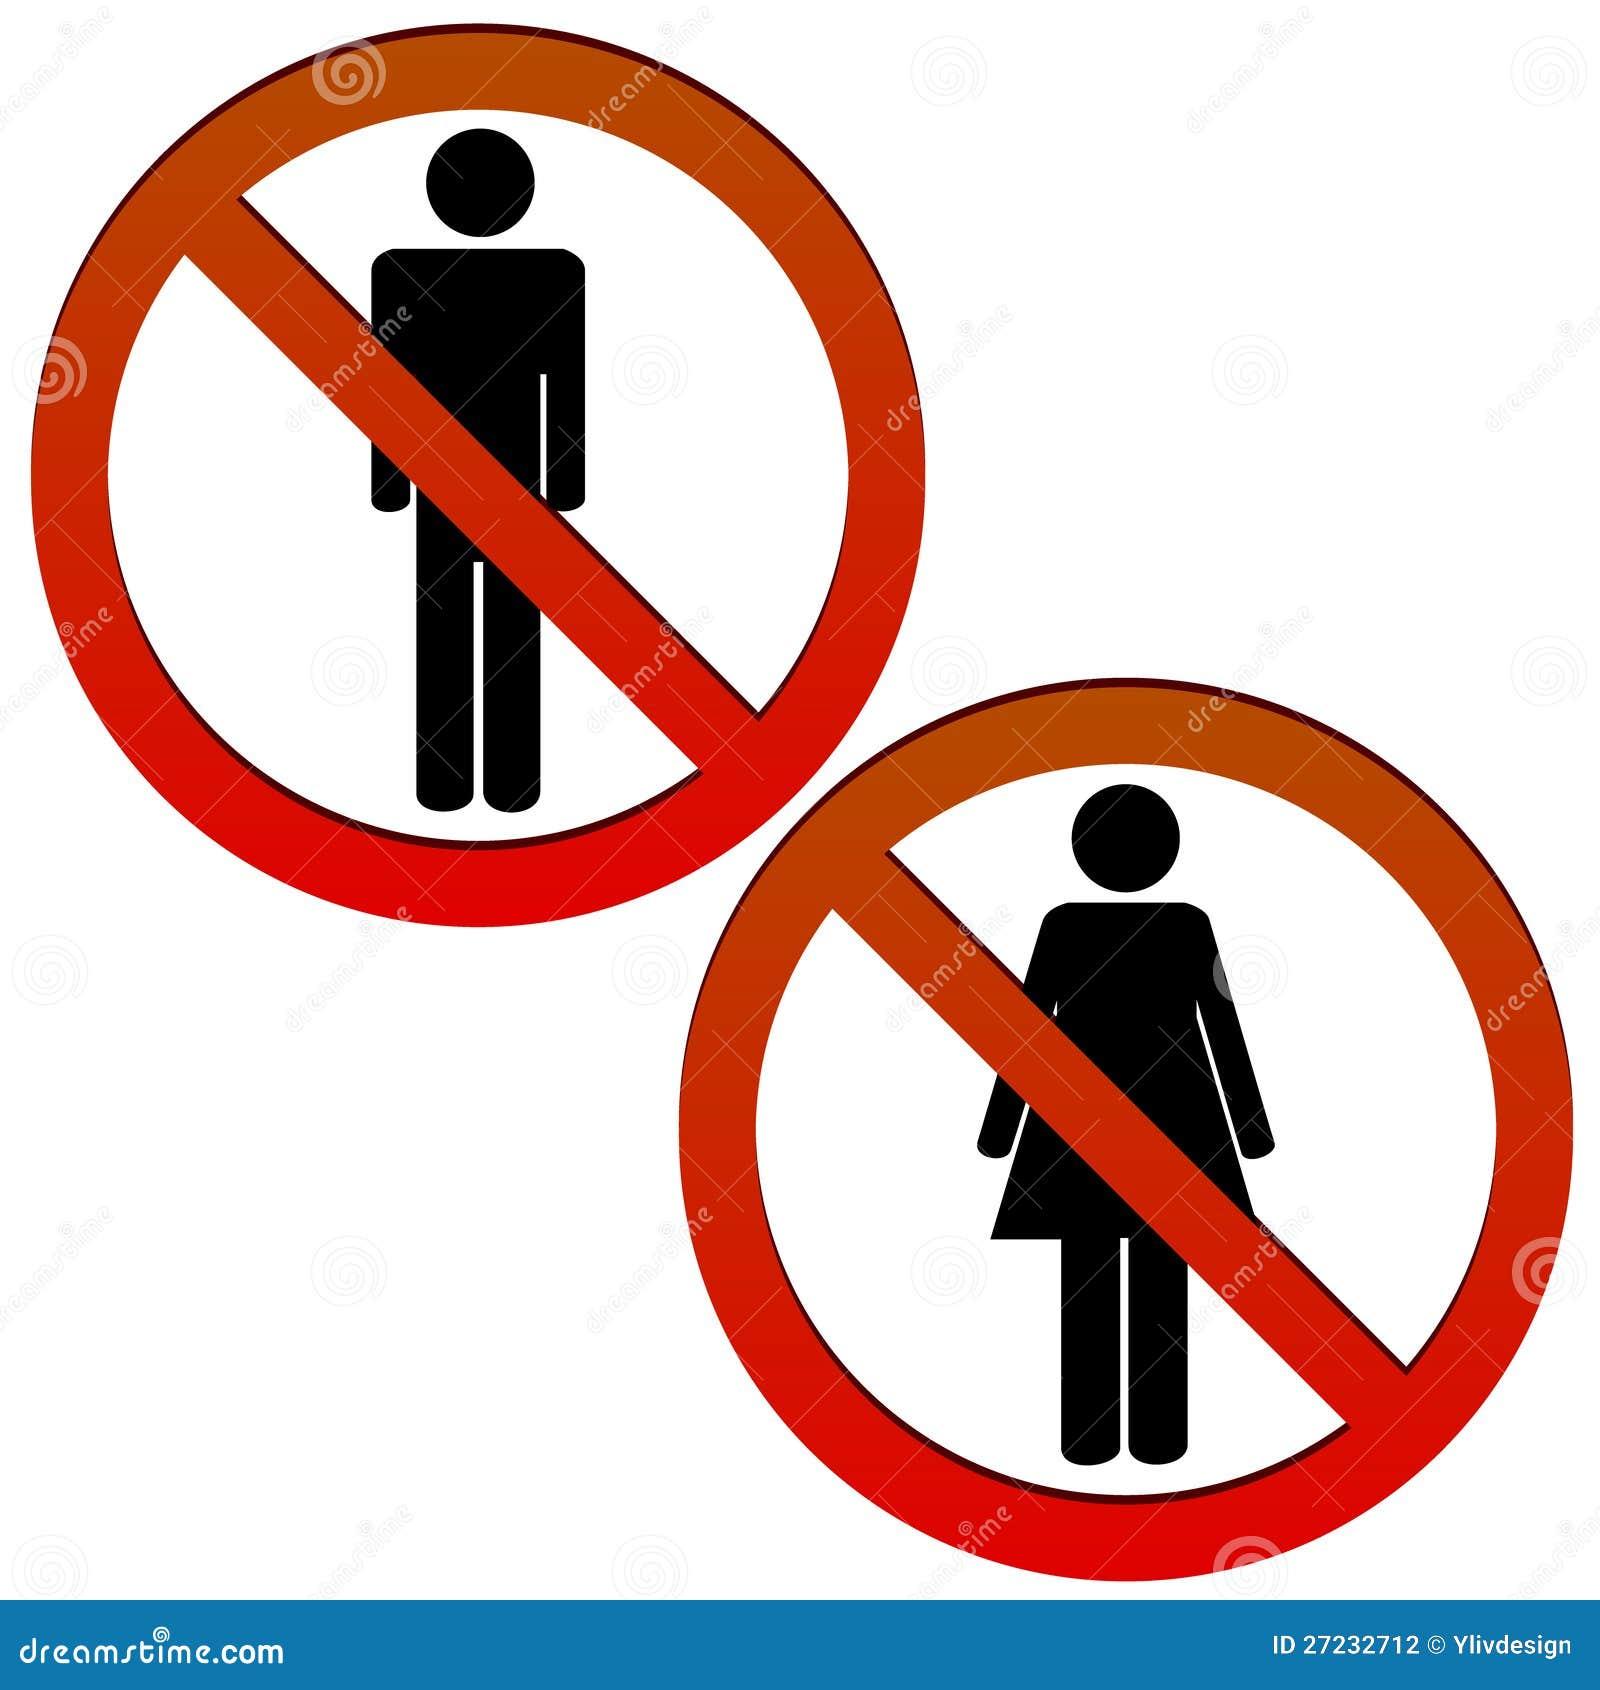 No Man And No Woman Stock Photography Image 27232712